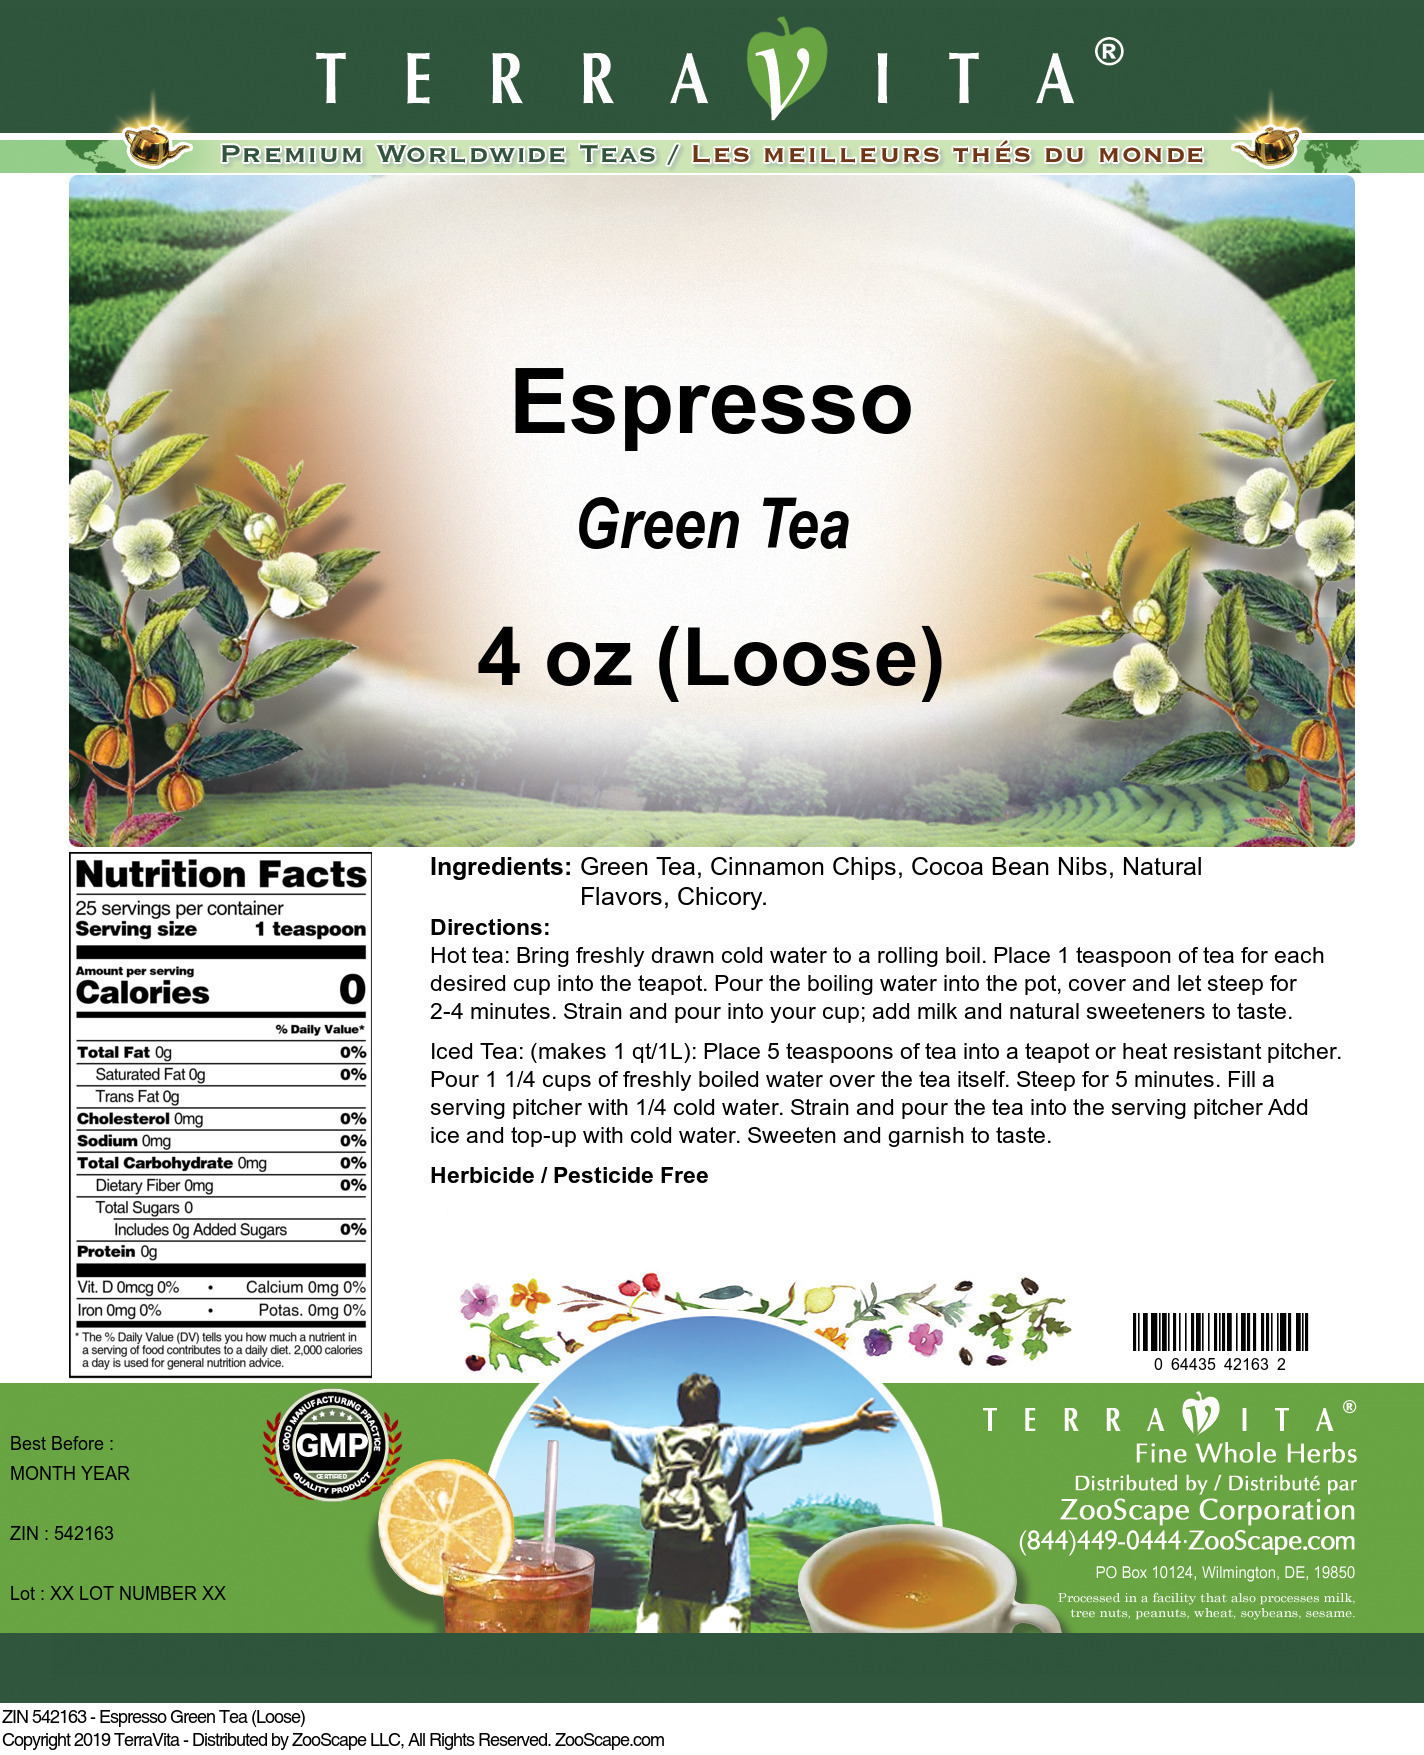 Espresso Green Tea (Loose)